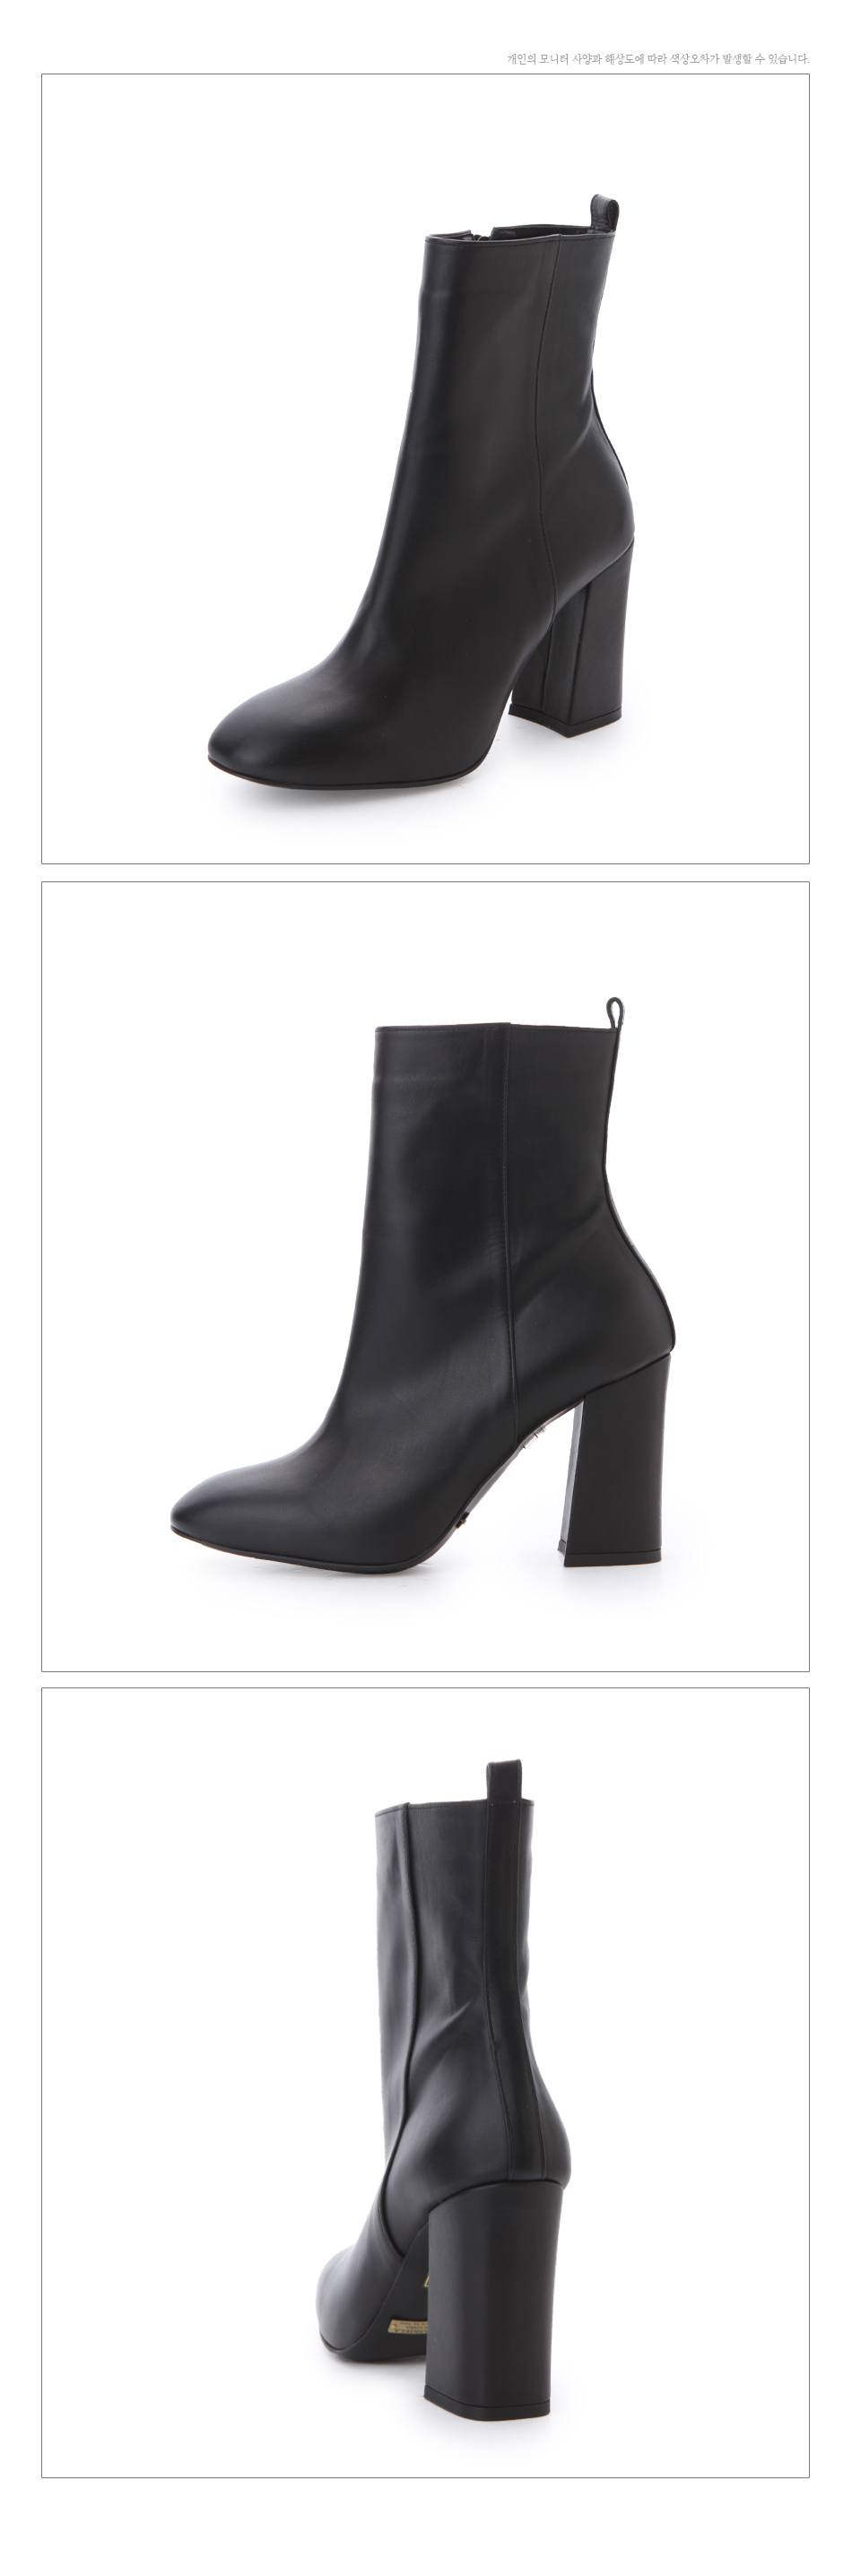 Boots Nữ Thiết Kế  7/9cm - GB963